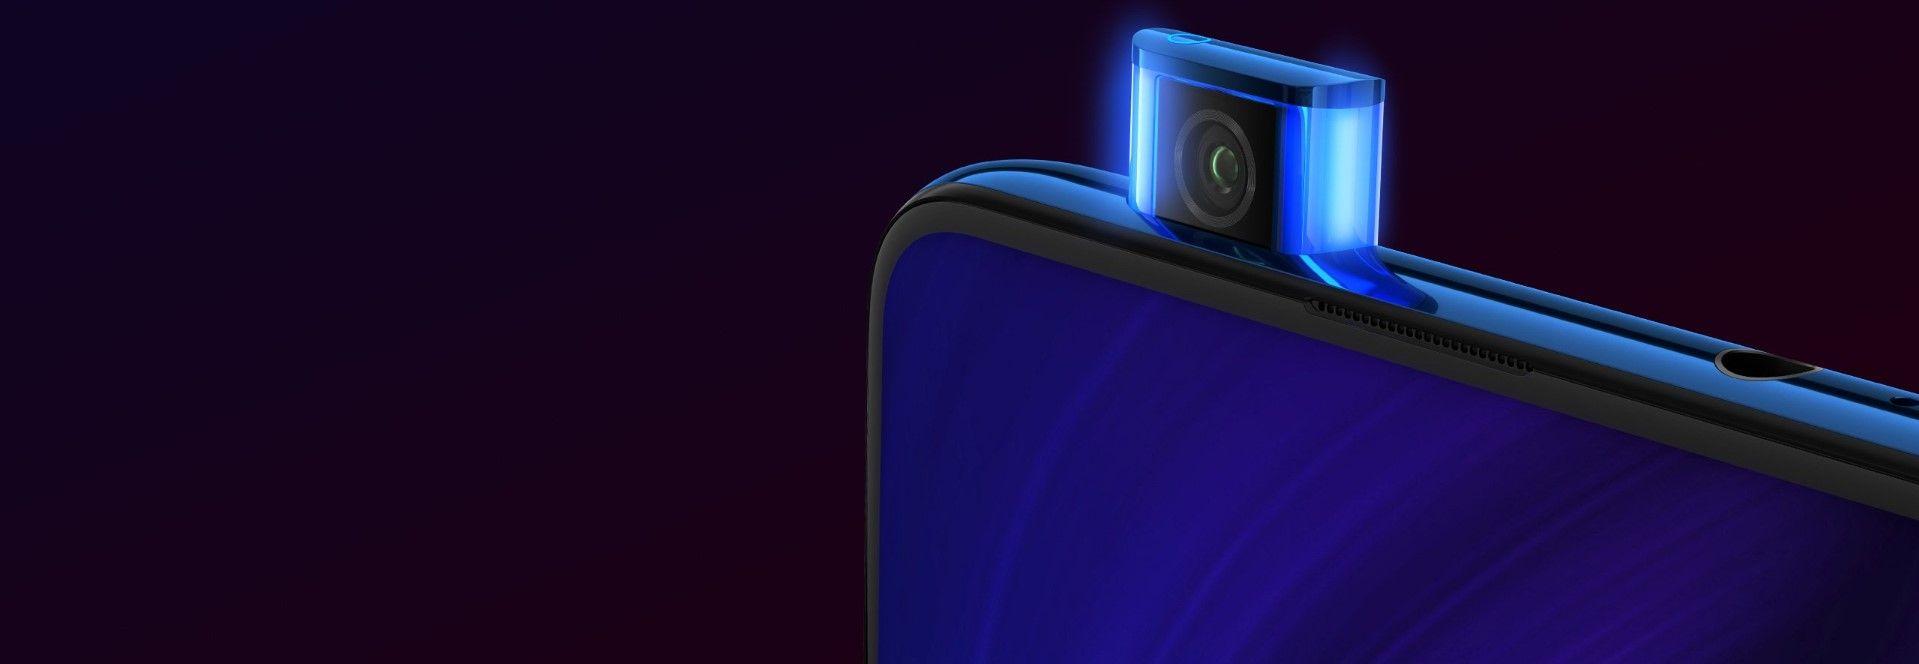 Xiaomi Mi 9T Pro выдвижная камера